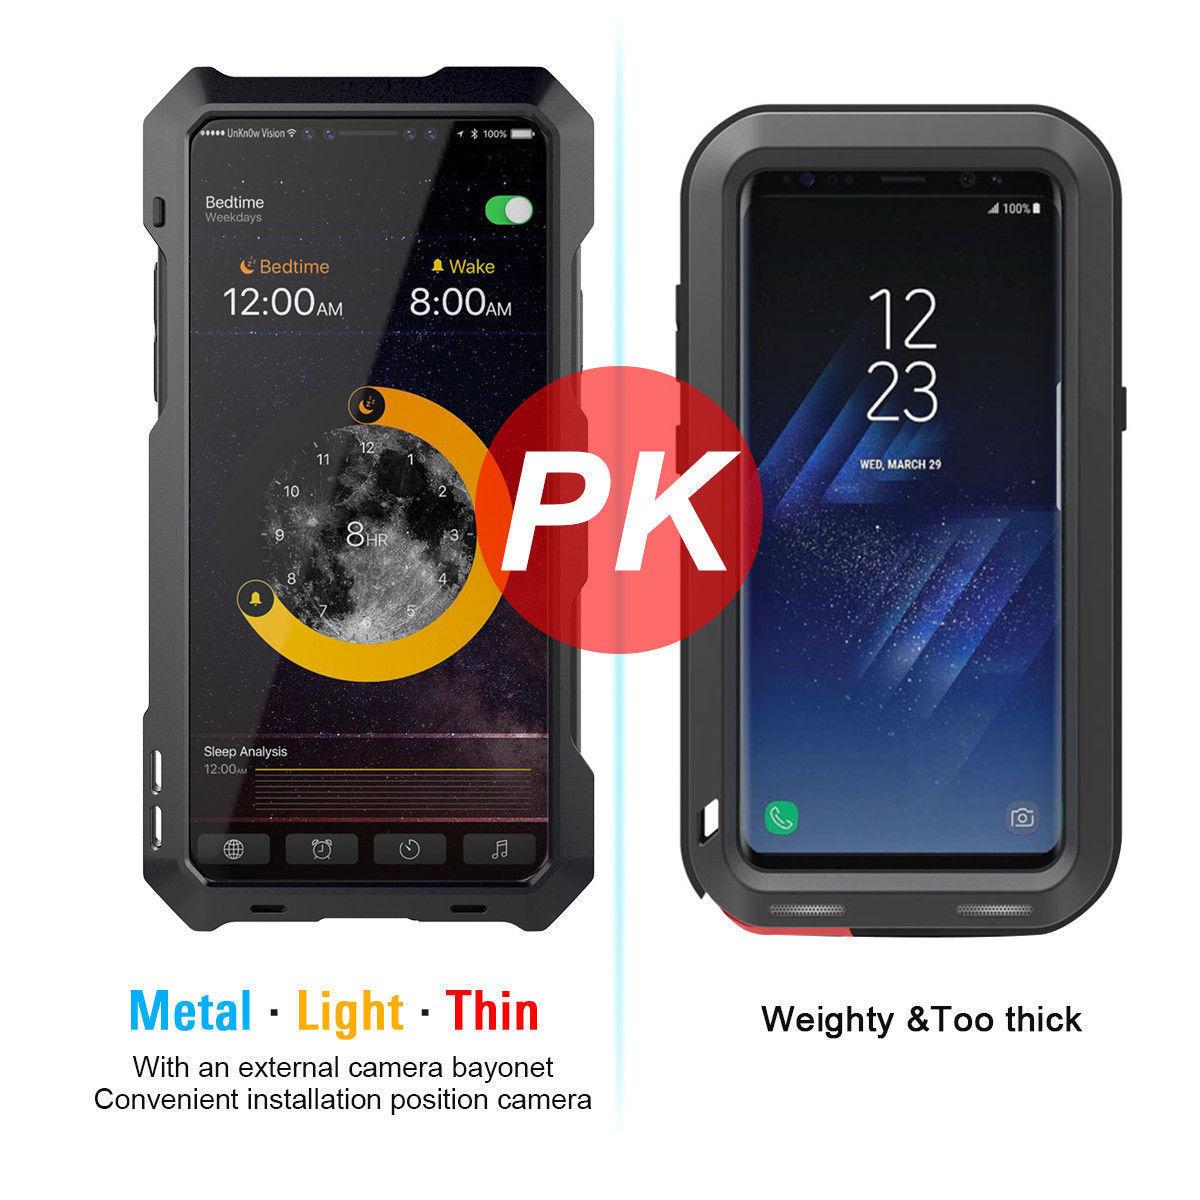 Wireless Backup Camera Wifi iPhone IPhone - Compare Models - Apple IPhone 4 - Wikipedia